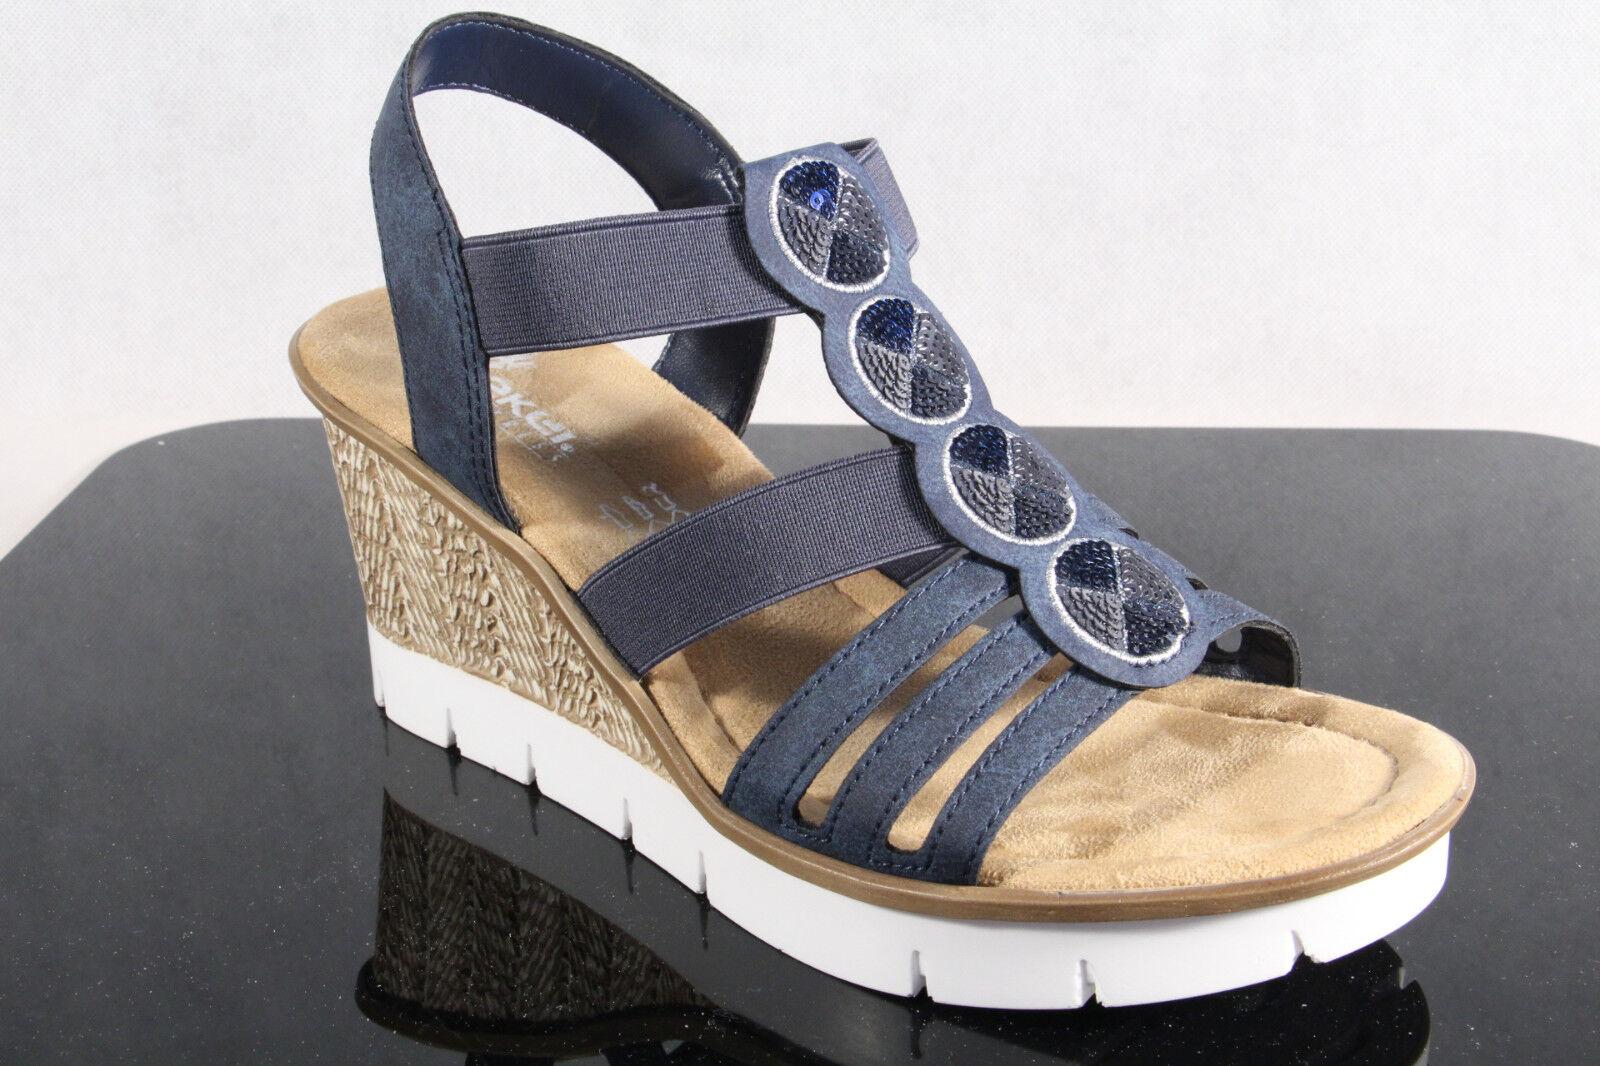 Rieker Damen Sandale Sandalette Sandalen NEU Sling blau 65515 NEU Sandalen 3cf572